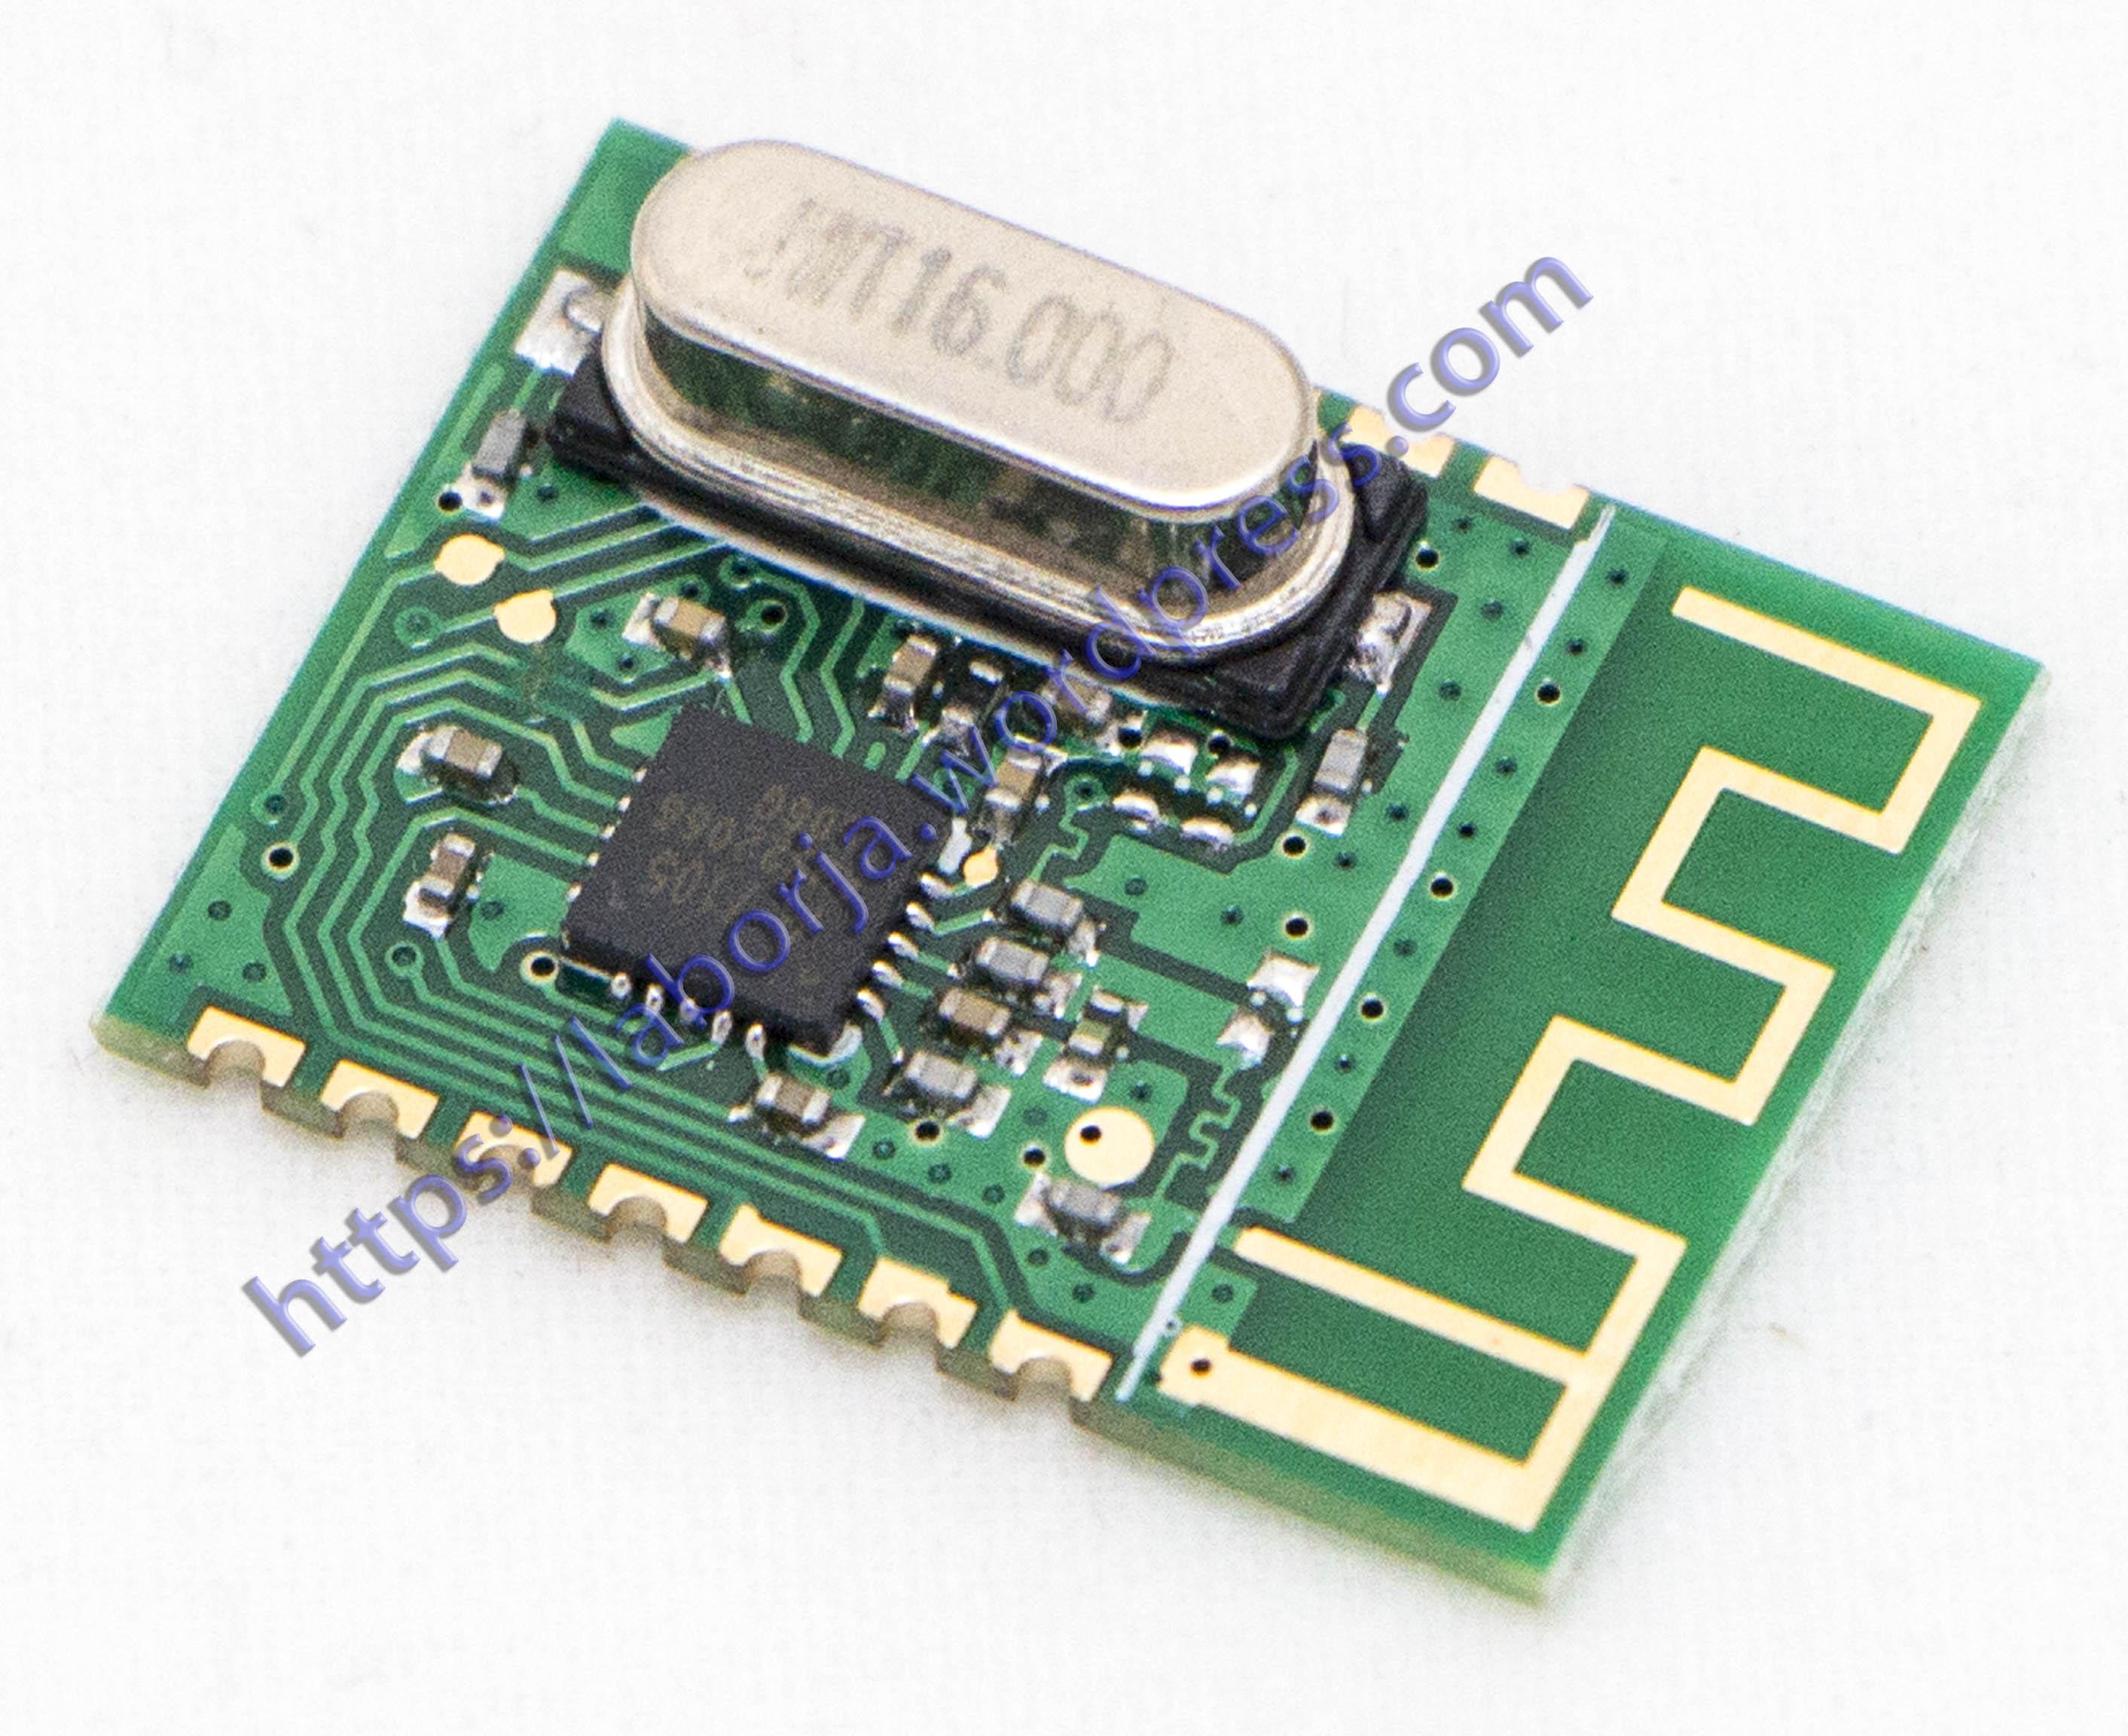 A7105 24g Wireless Transceiver Module Borja Home Page Circuit Diy Breadboard 830 Point Board 65pcs Jumper Wire Kit Set Yc